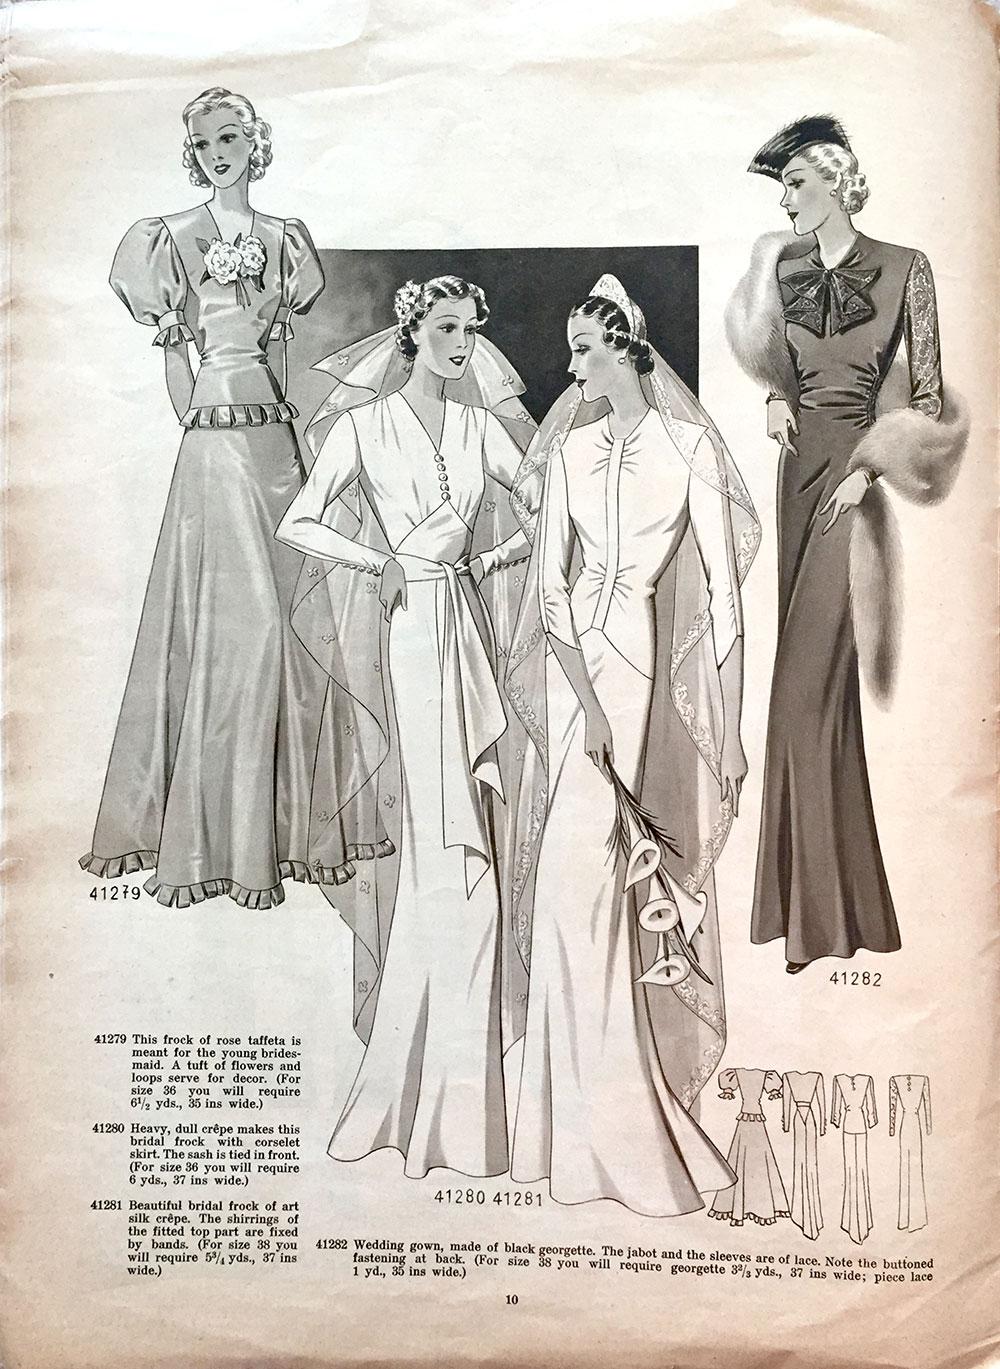 1938 wedding gowns